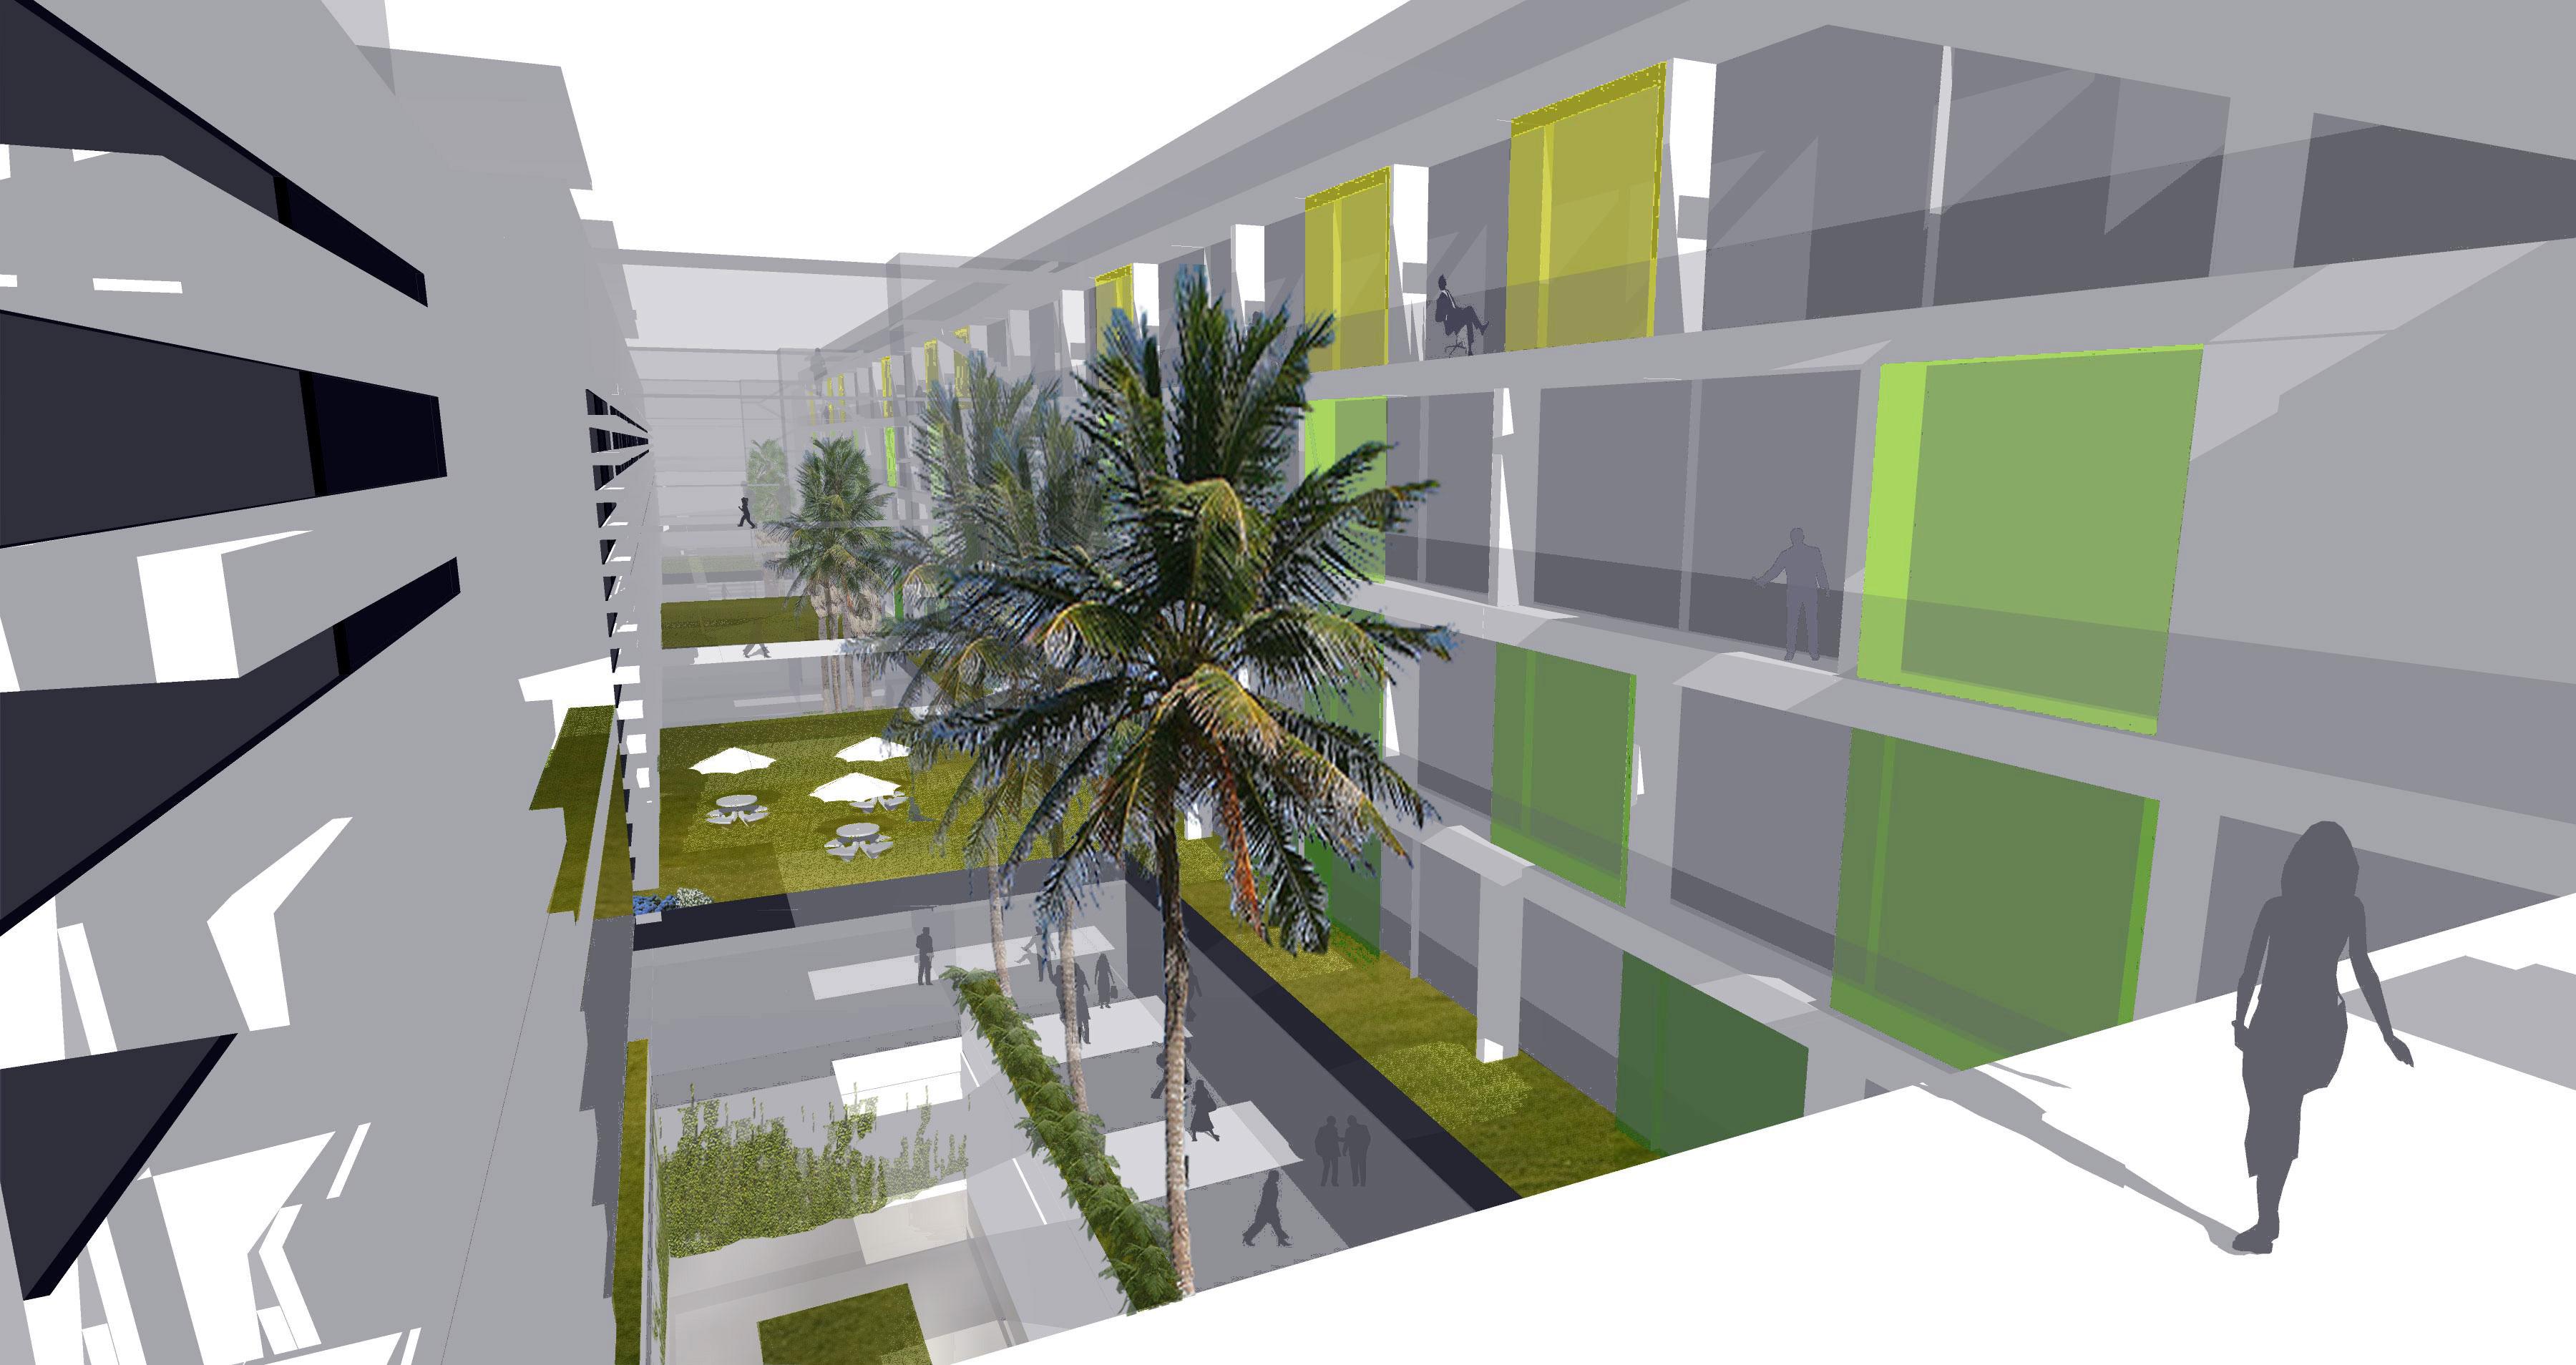 Boulevard and Atrium